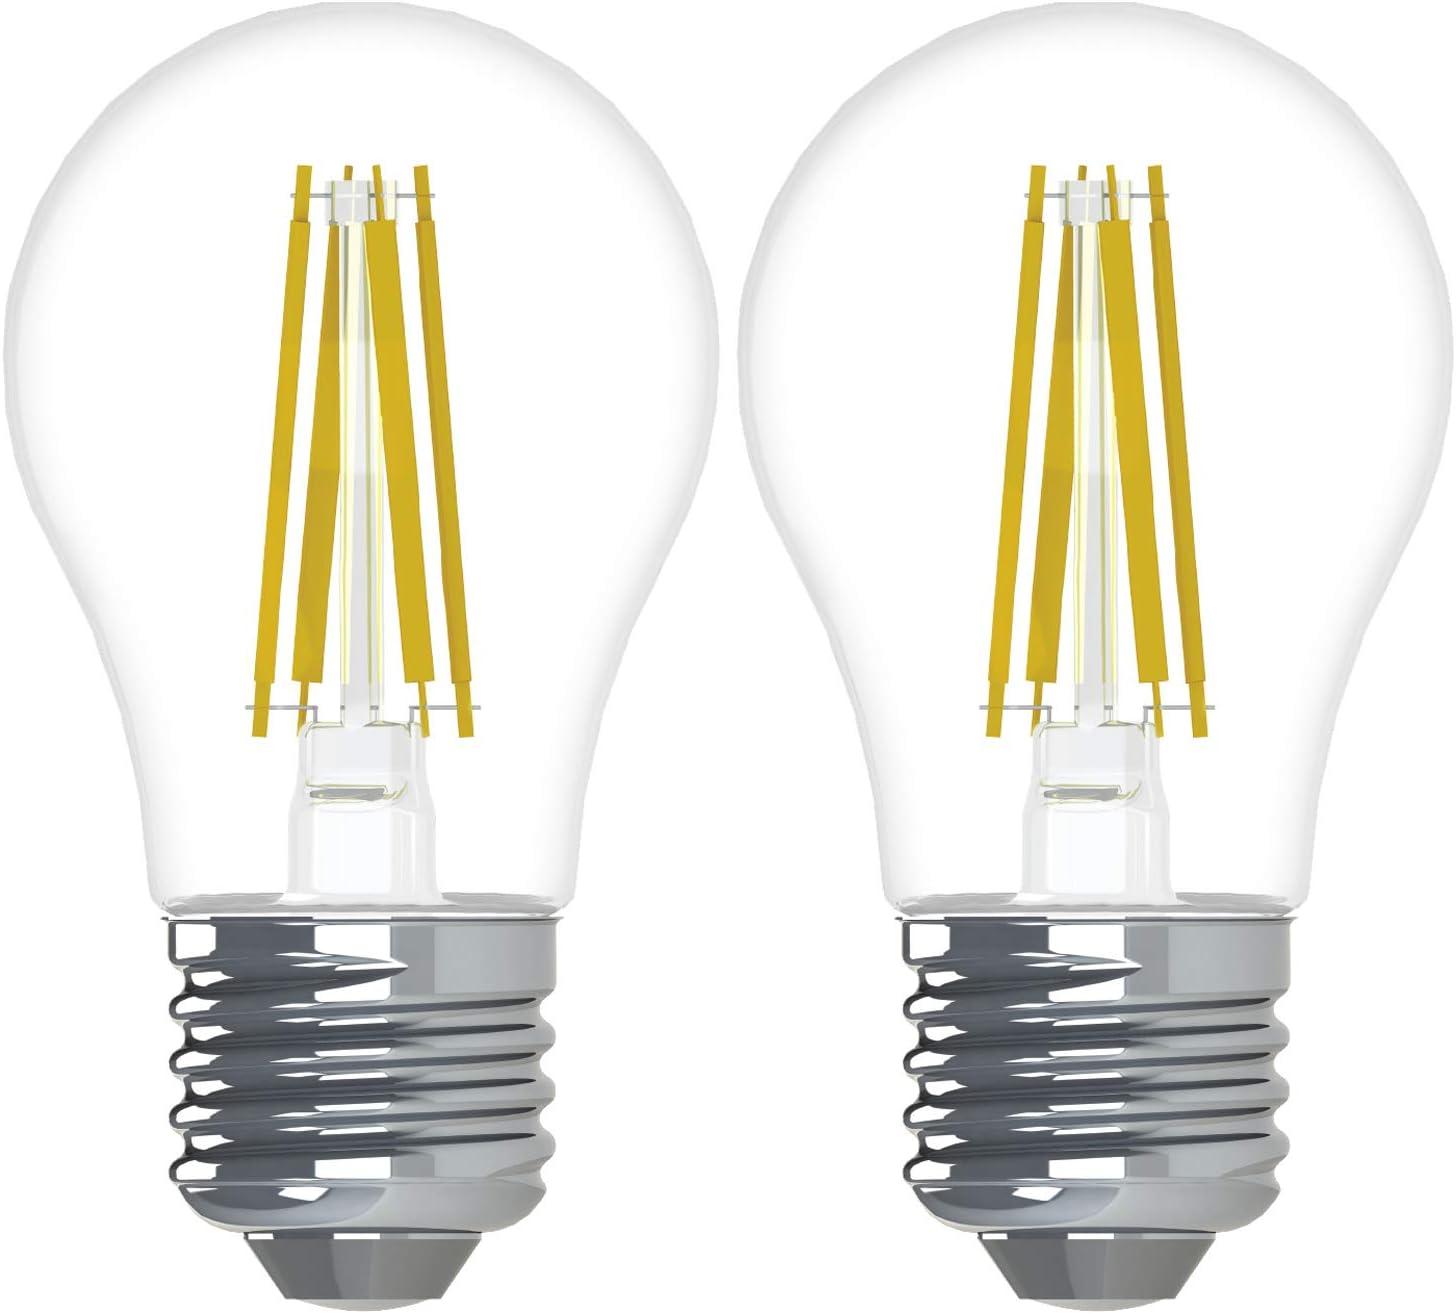 General Electric Bulb Clear Shape HD Refresh LED Light Medium Base 60 Watt, Soft-White 4 Bulbs